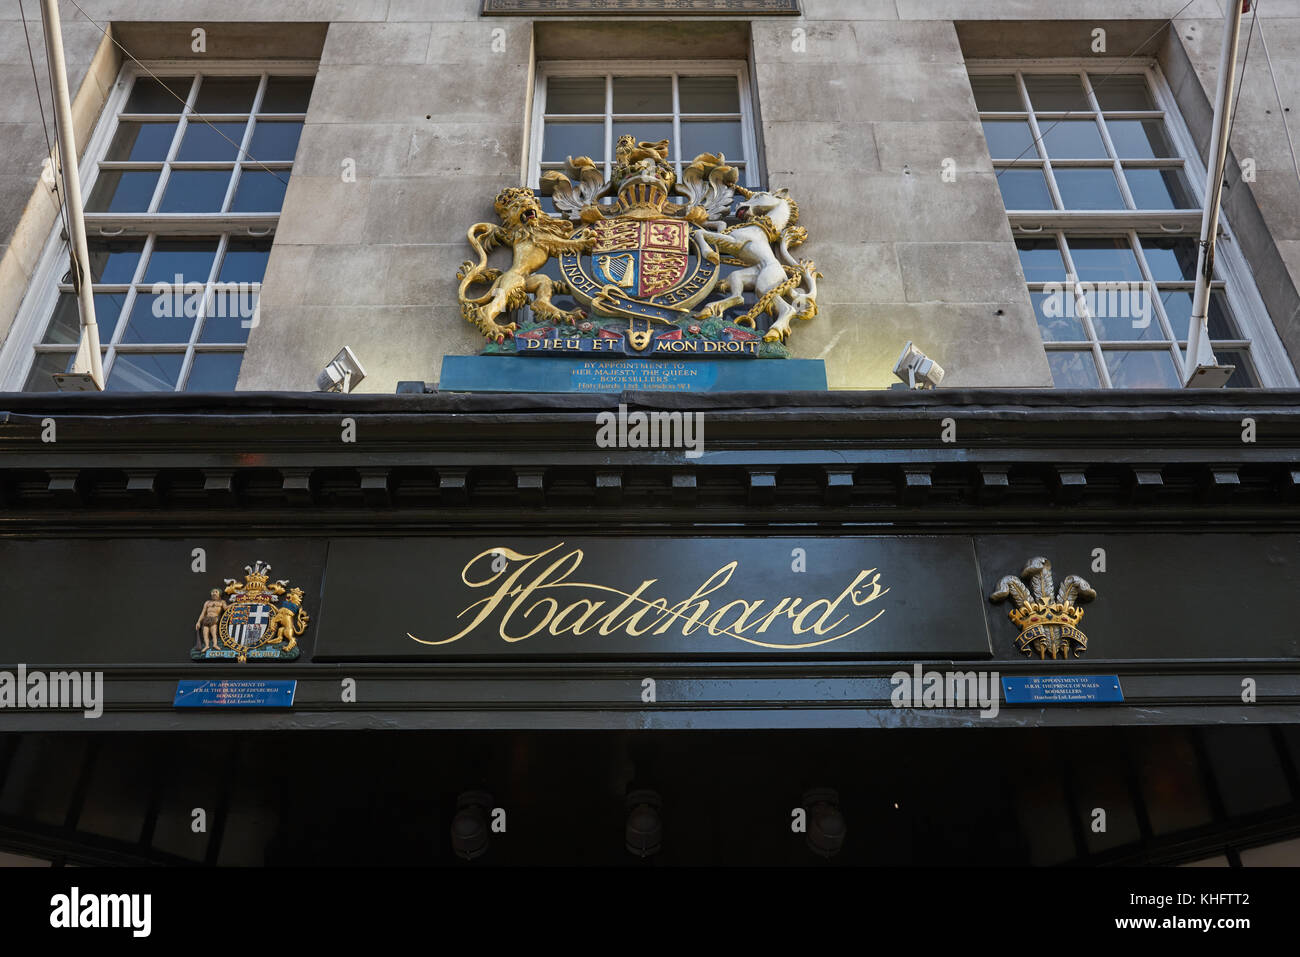 hatchard's book shop london - Stock Image